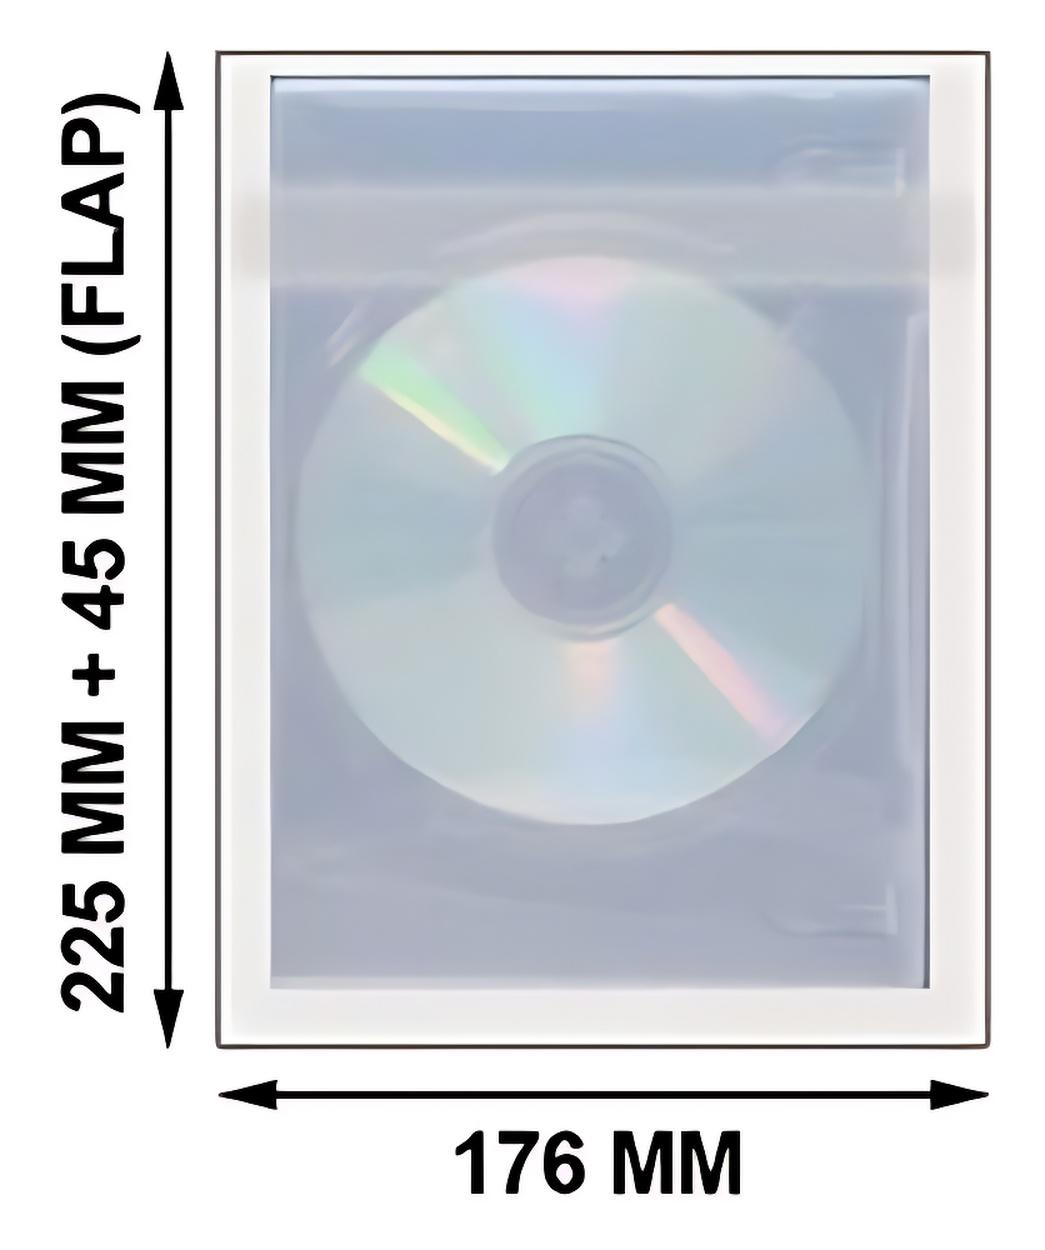 Wrap   Case   DVD   Bag